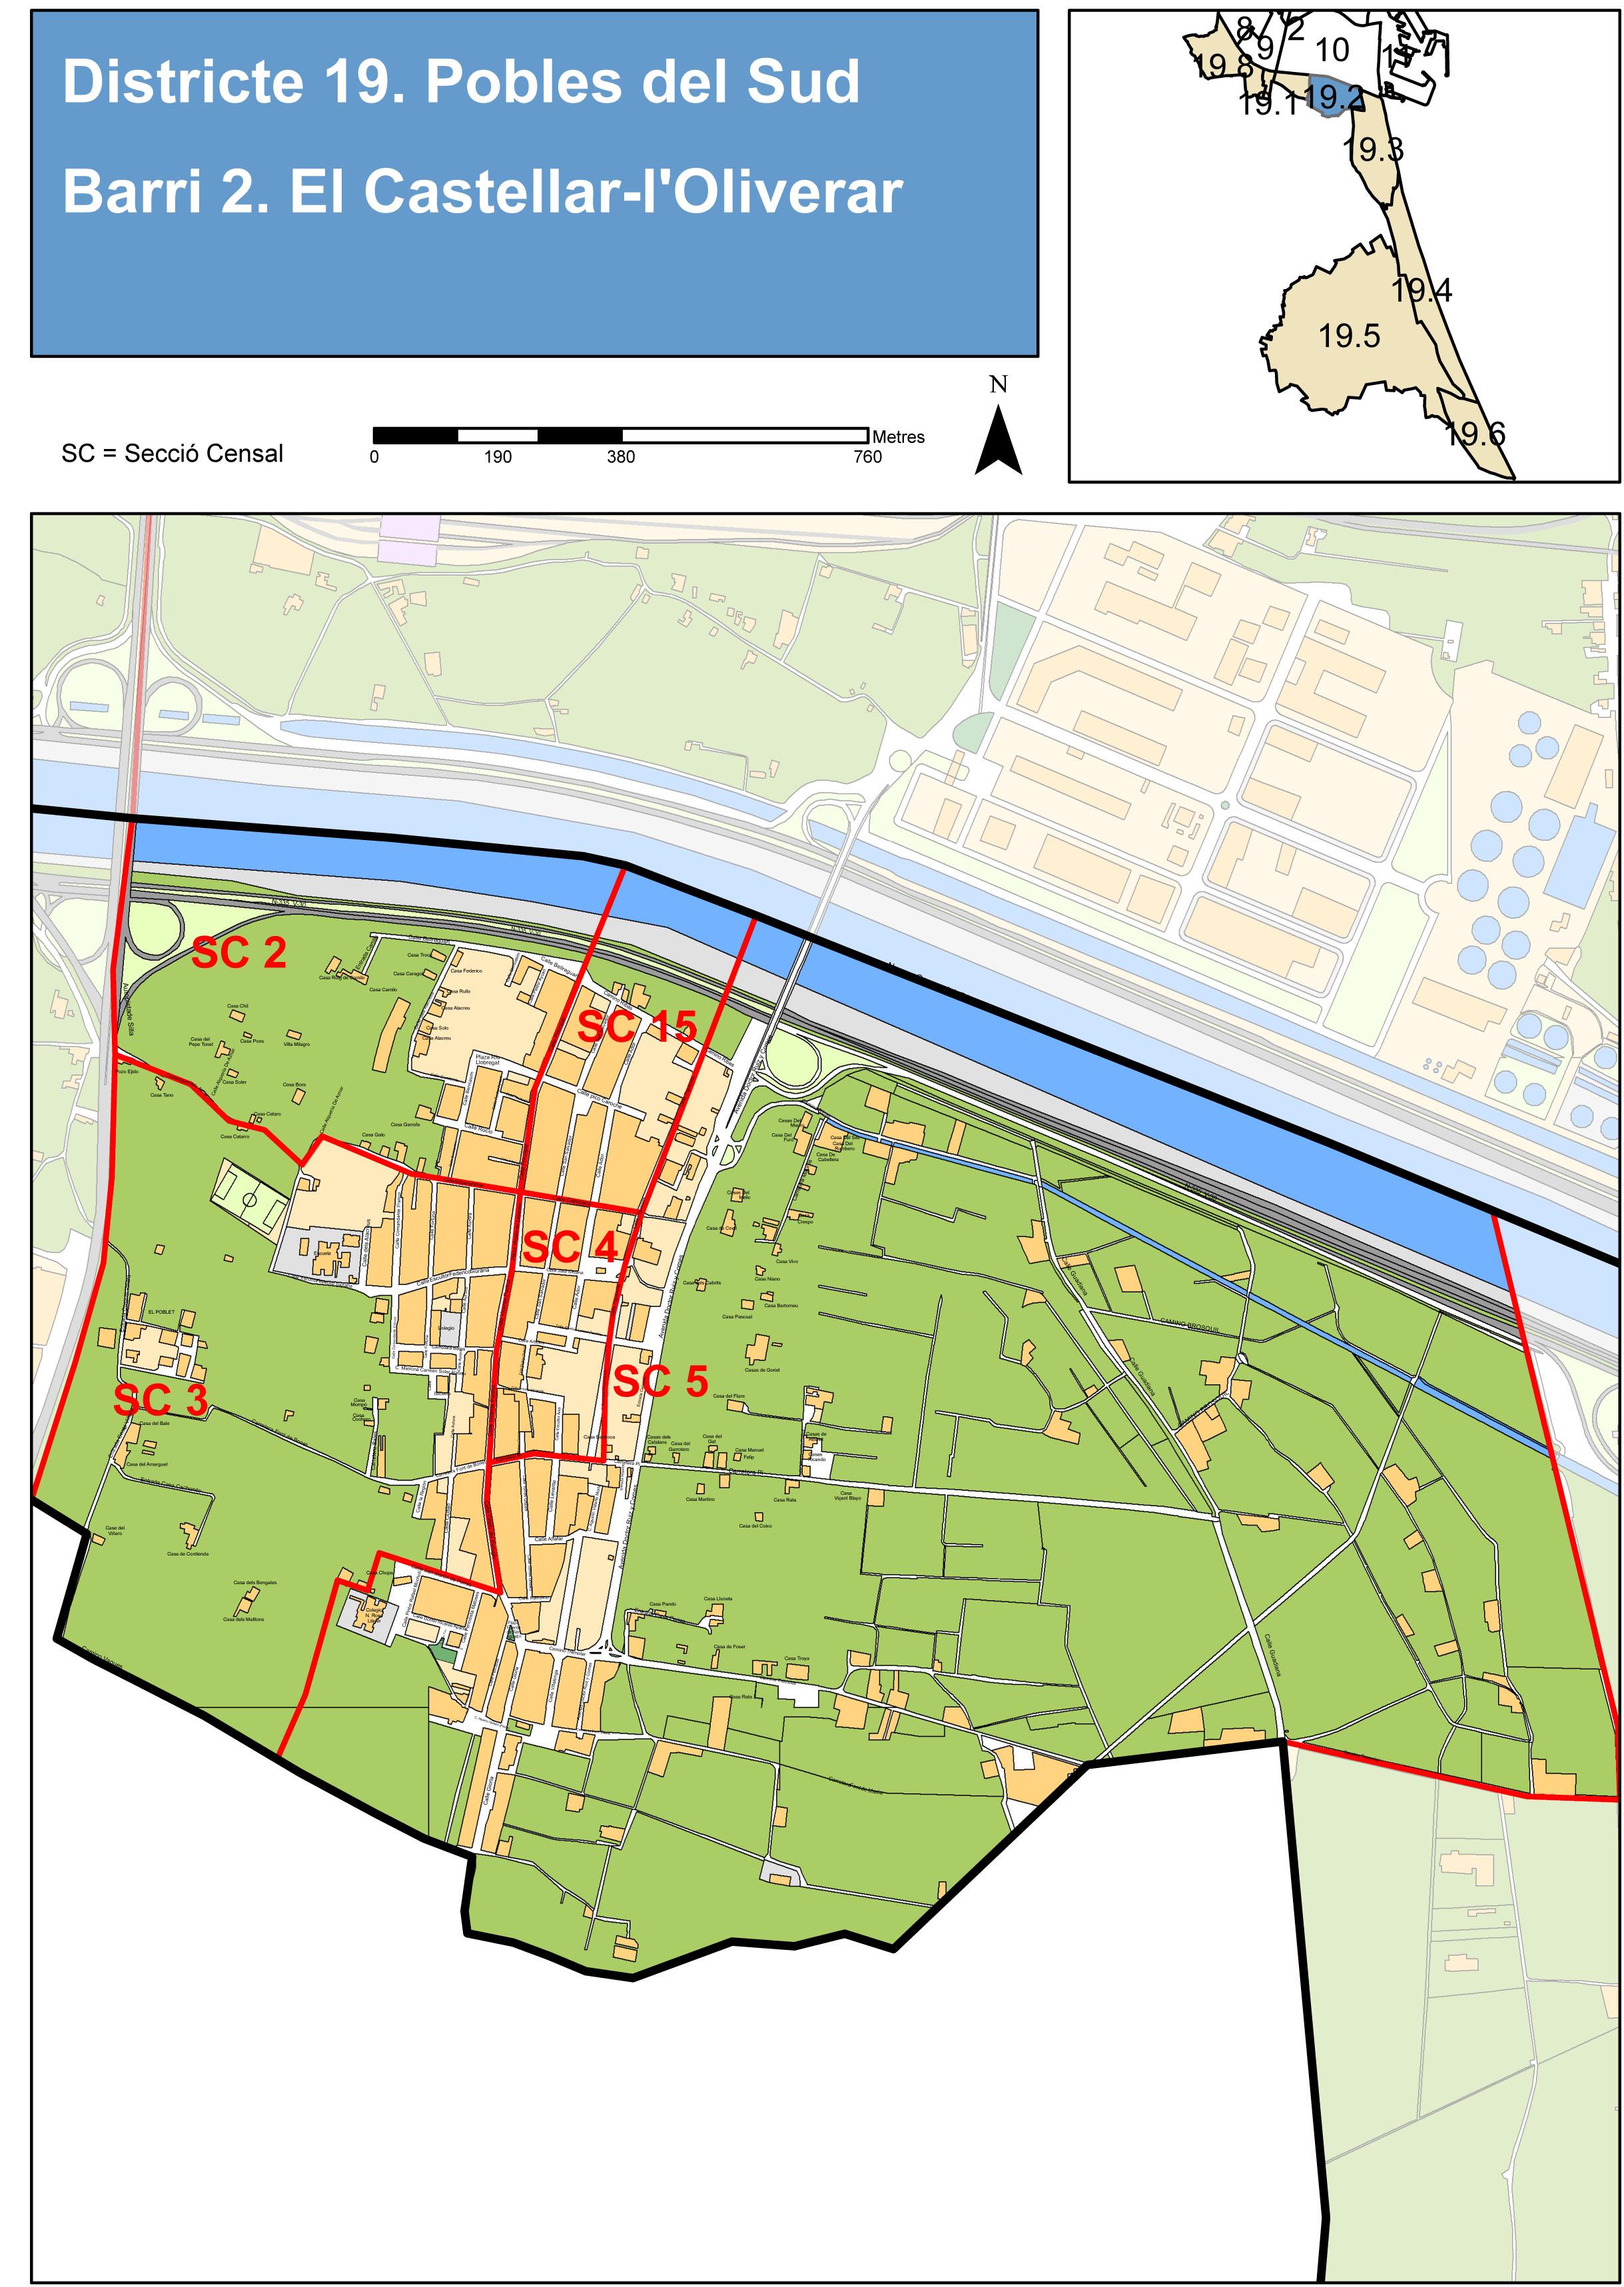 Castellar-L'Oliveral, pedanía de Valencia